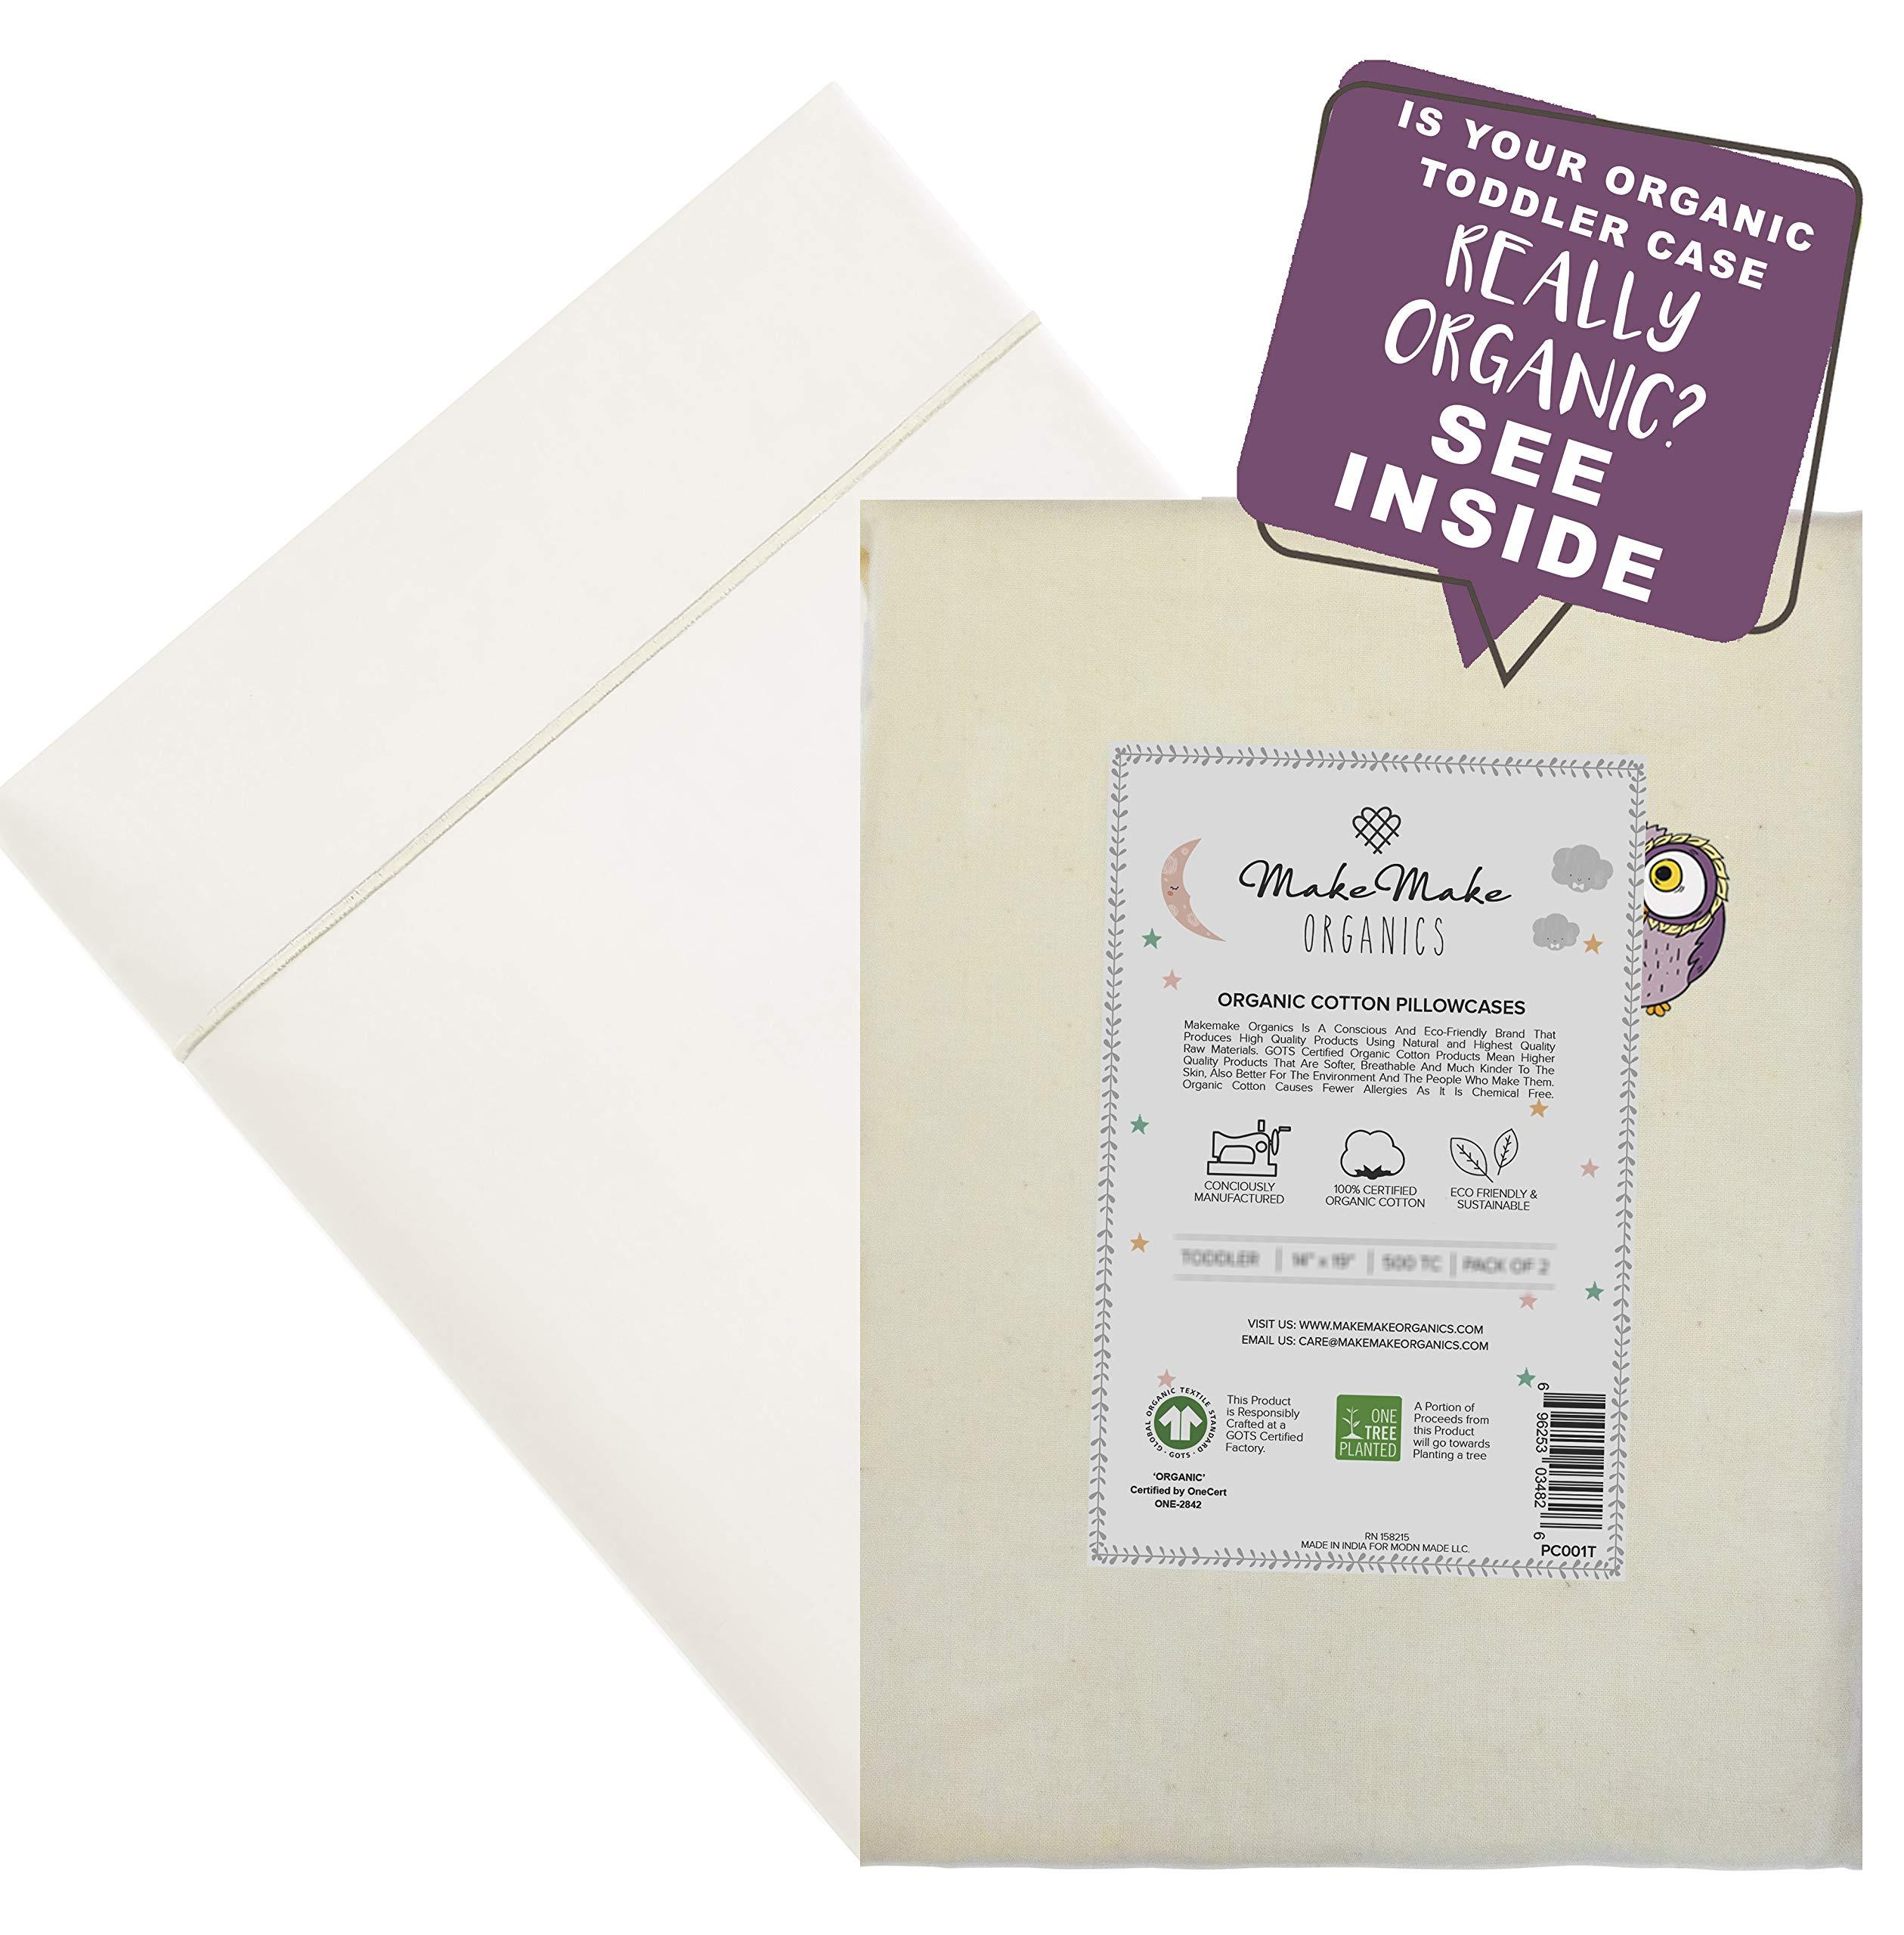 MakeMake Organics Organic Cotton Pillowcase Kids (Set of 2) GOTS Certified Organic Pillowcase Youth Junior Chemical Free Anti Allergy Ultra Soft Safe Fits 14x20 Youth Junior Kids (Pearl White, 16x22) by MakeMake Organics